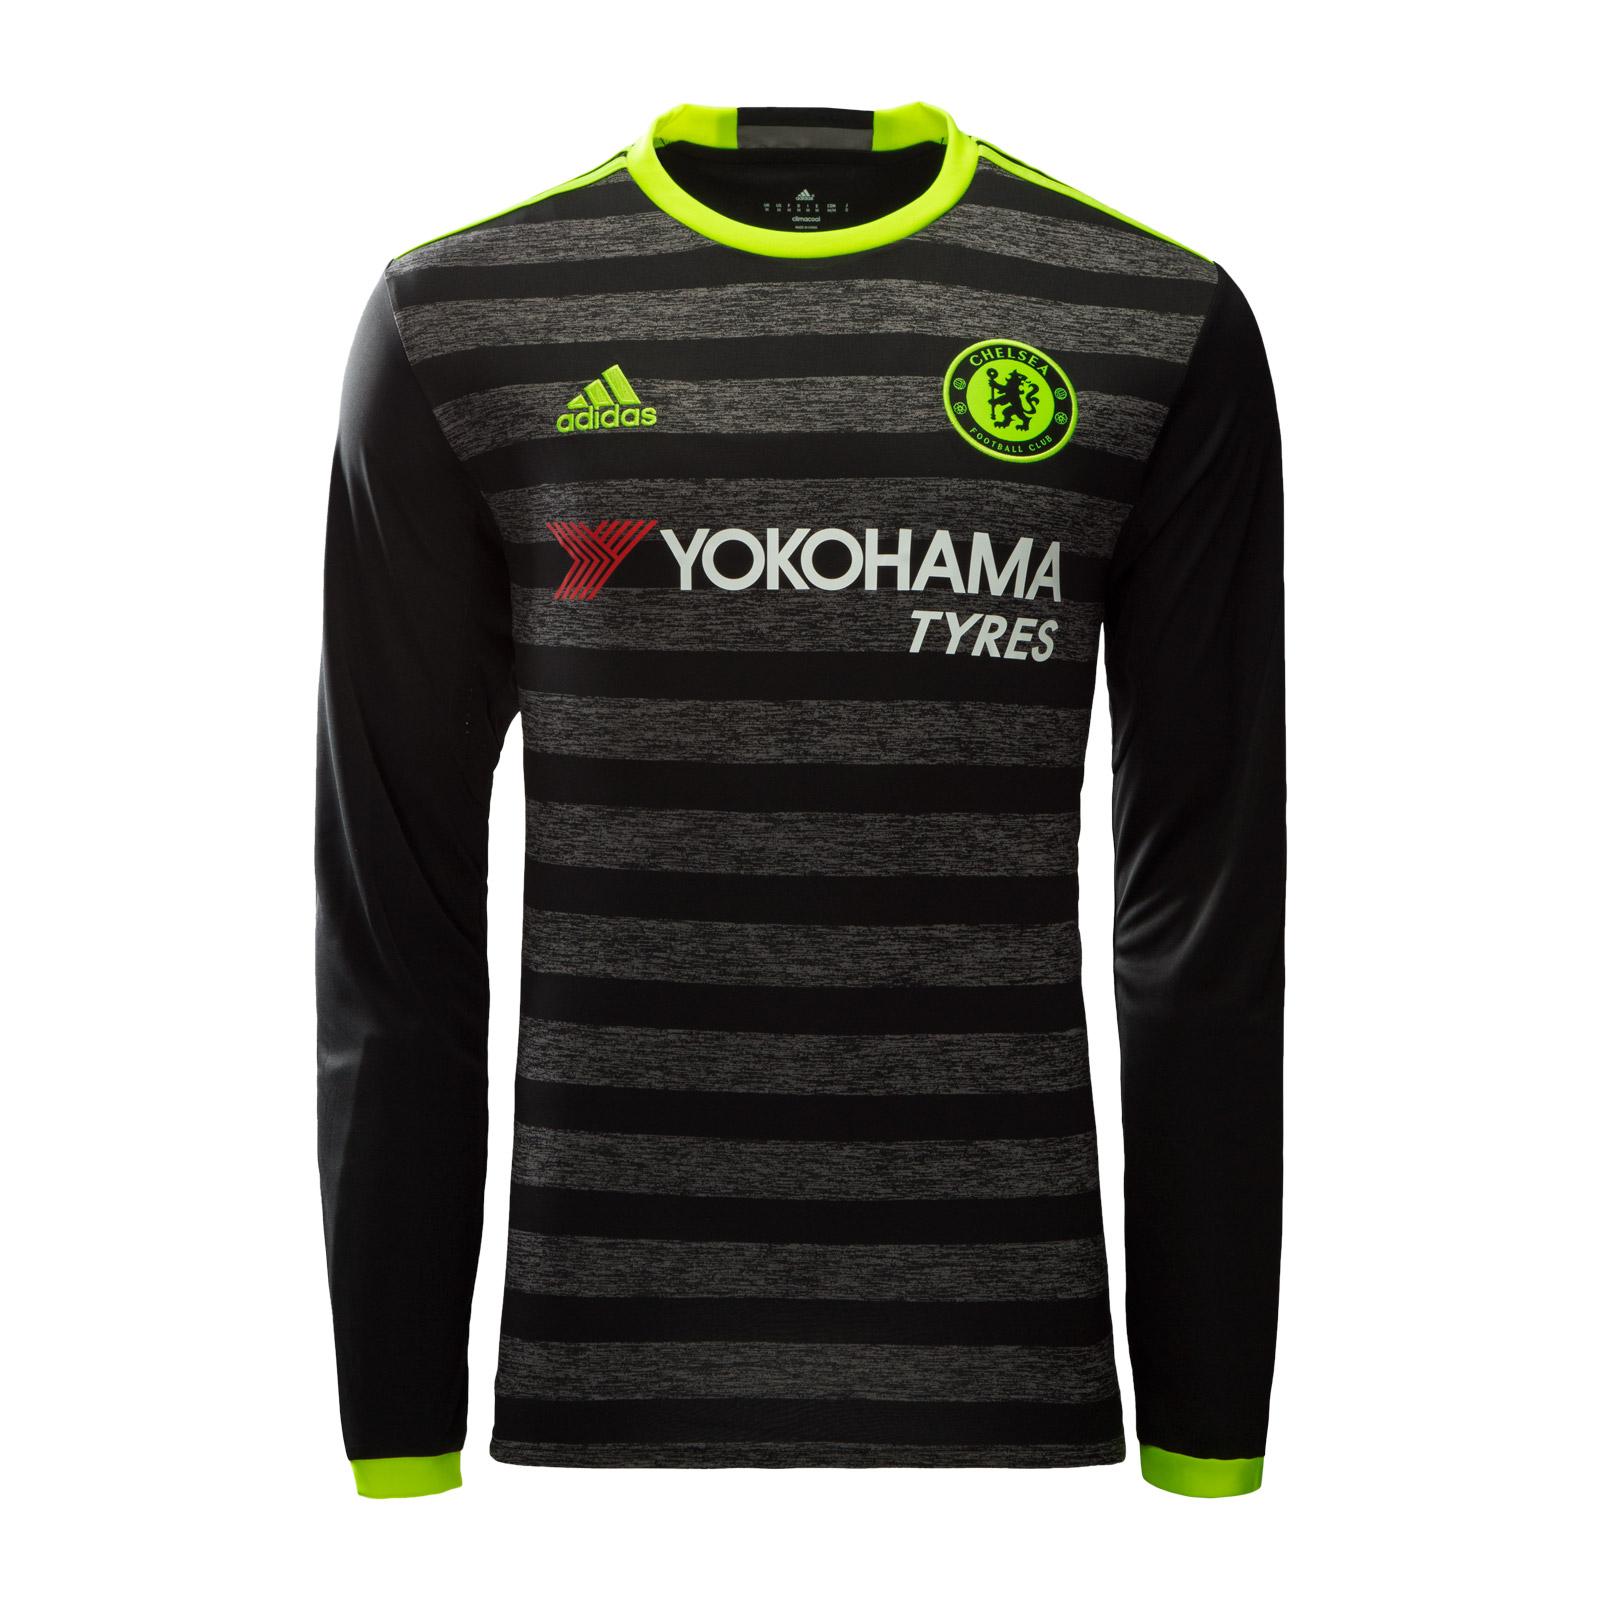 Chelsea 2016-2017 Away Long Sleeve Shirt  AI7132  -  46.46 Teamzo.com 56817db5b